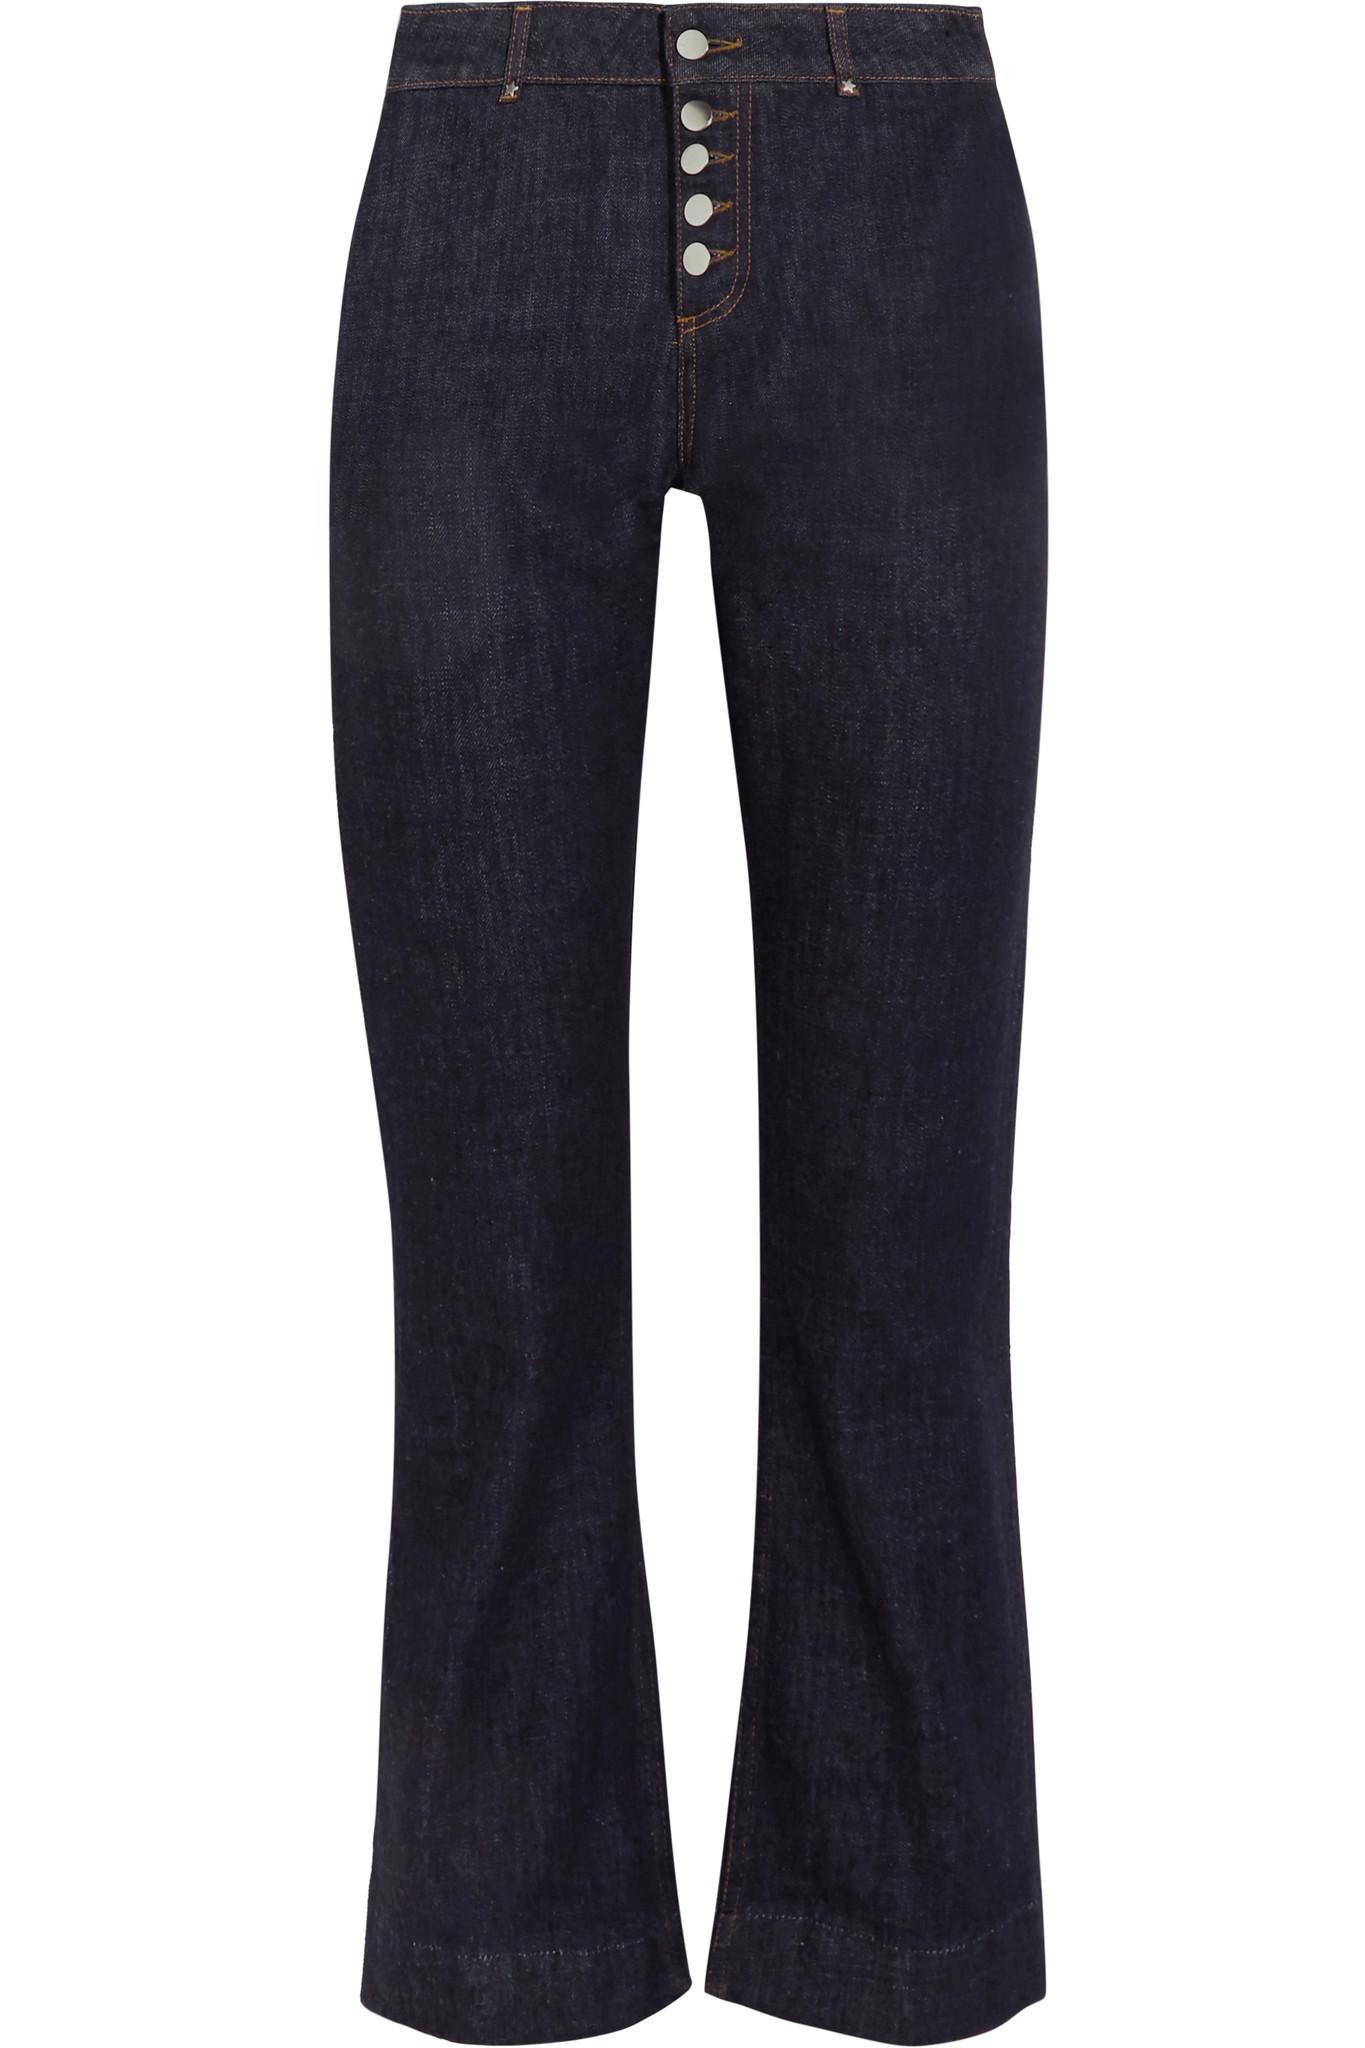 Mid-rise Straight-leg Jeans - Dark denim AlexaChung Cheap Sale Enjoy Recommend Cheap Online Cheap Sale Inexpensive Outlet Huge Surprise Sale Real Veul7NUx